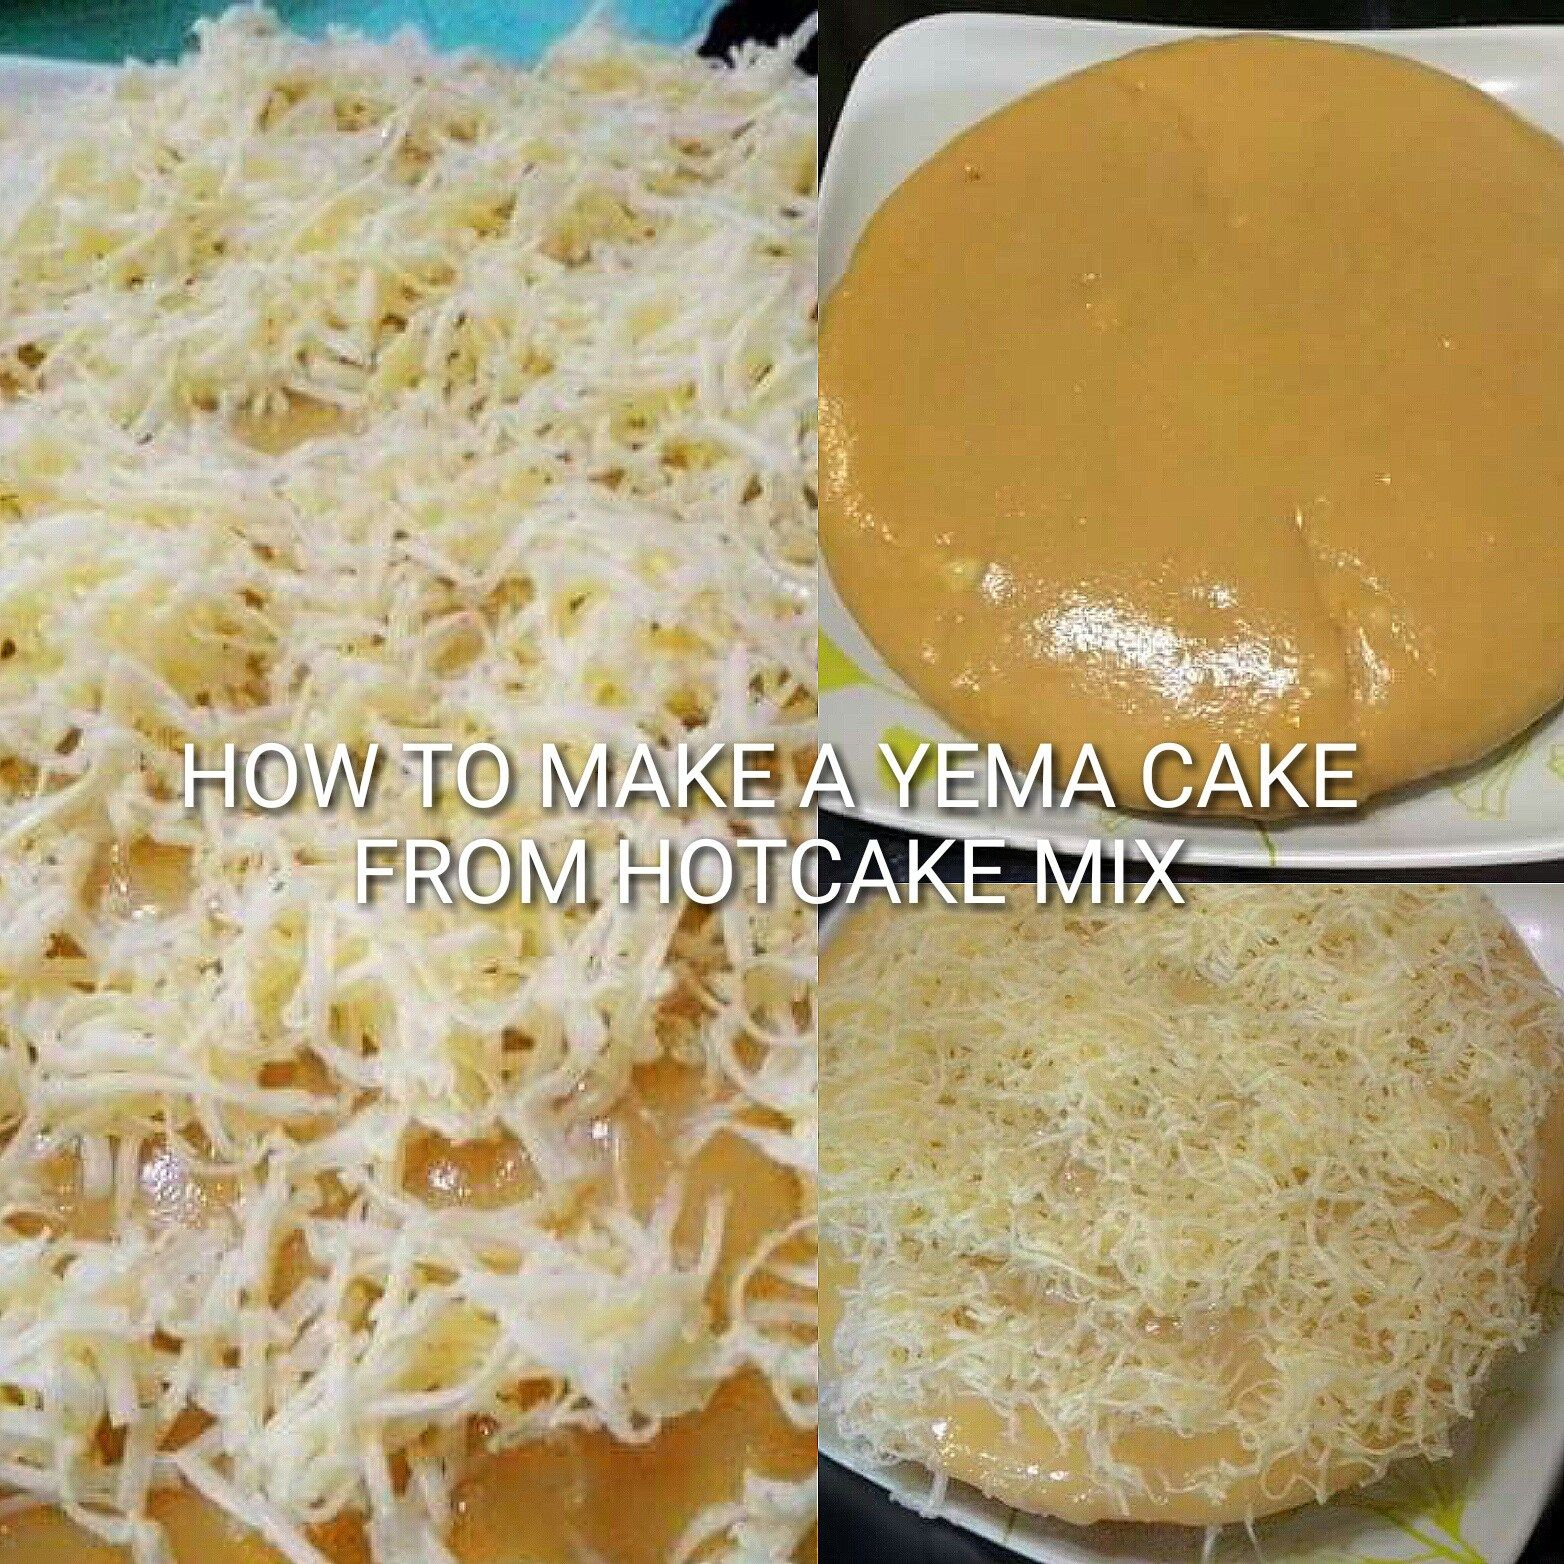 How to make a Yema Cake from a Hotcake Mix Yema cake